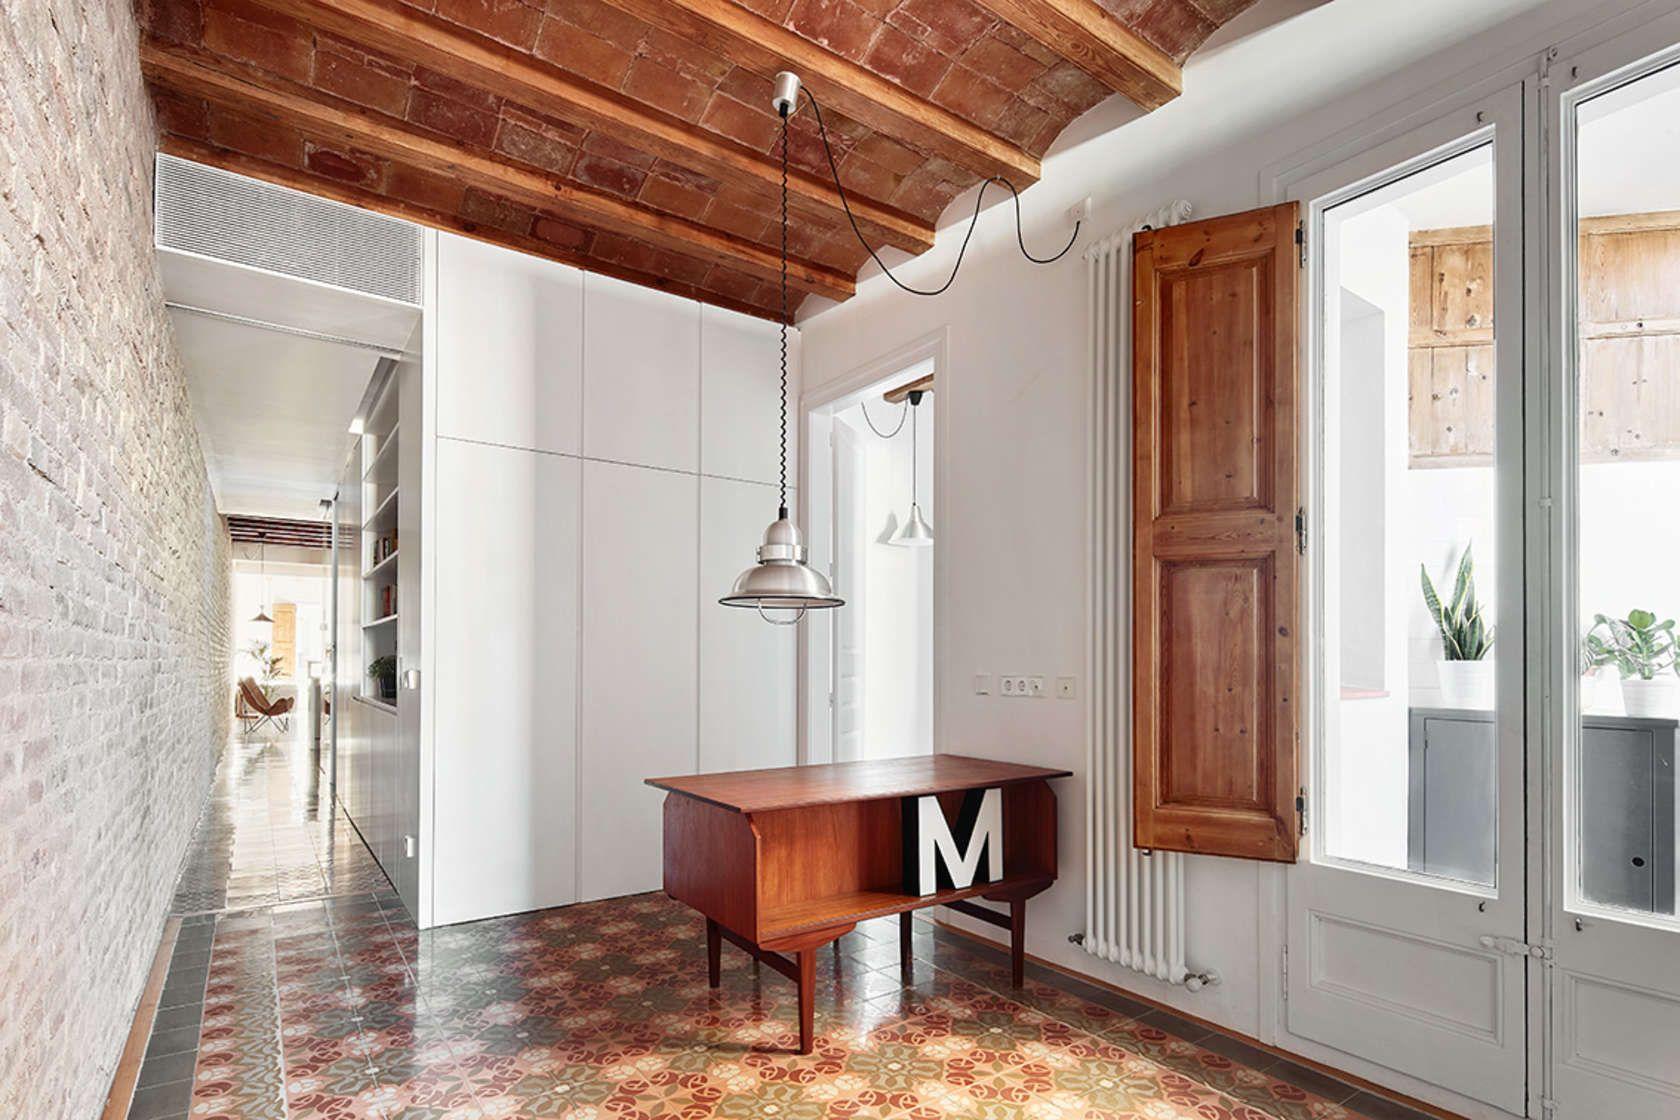 Karakteristieke Gewelfde Plafonds : The project consists in the refurbishment of an existing old flat